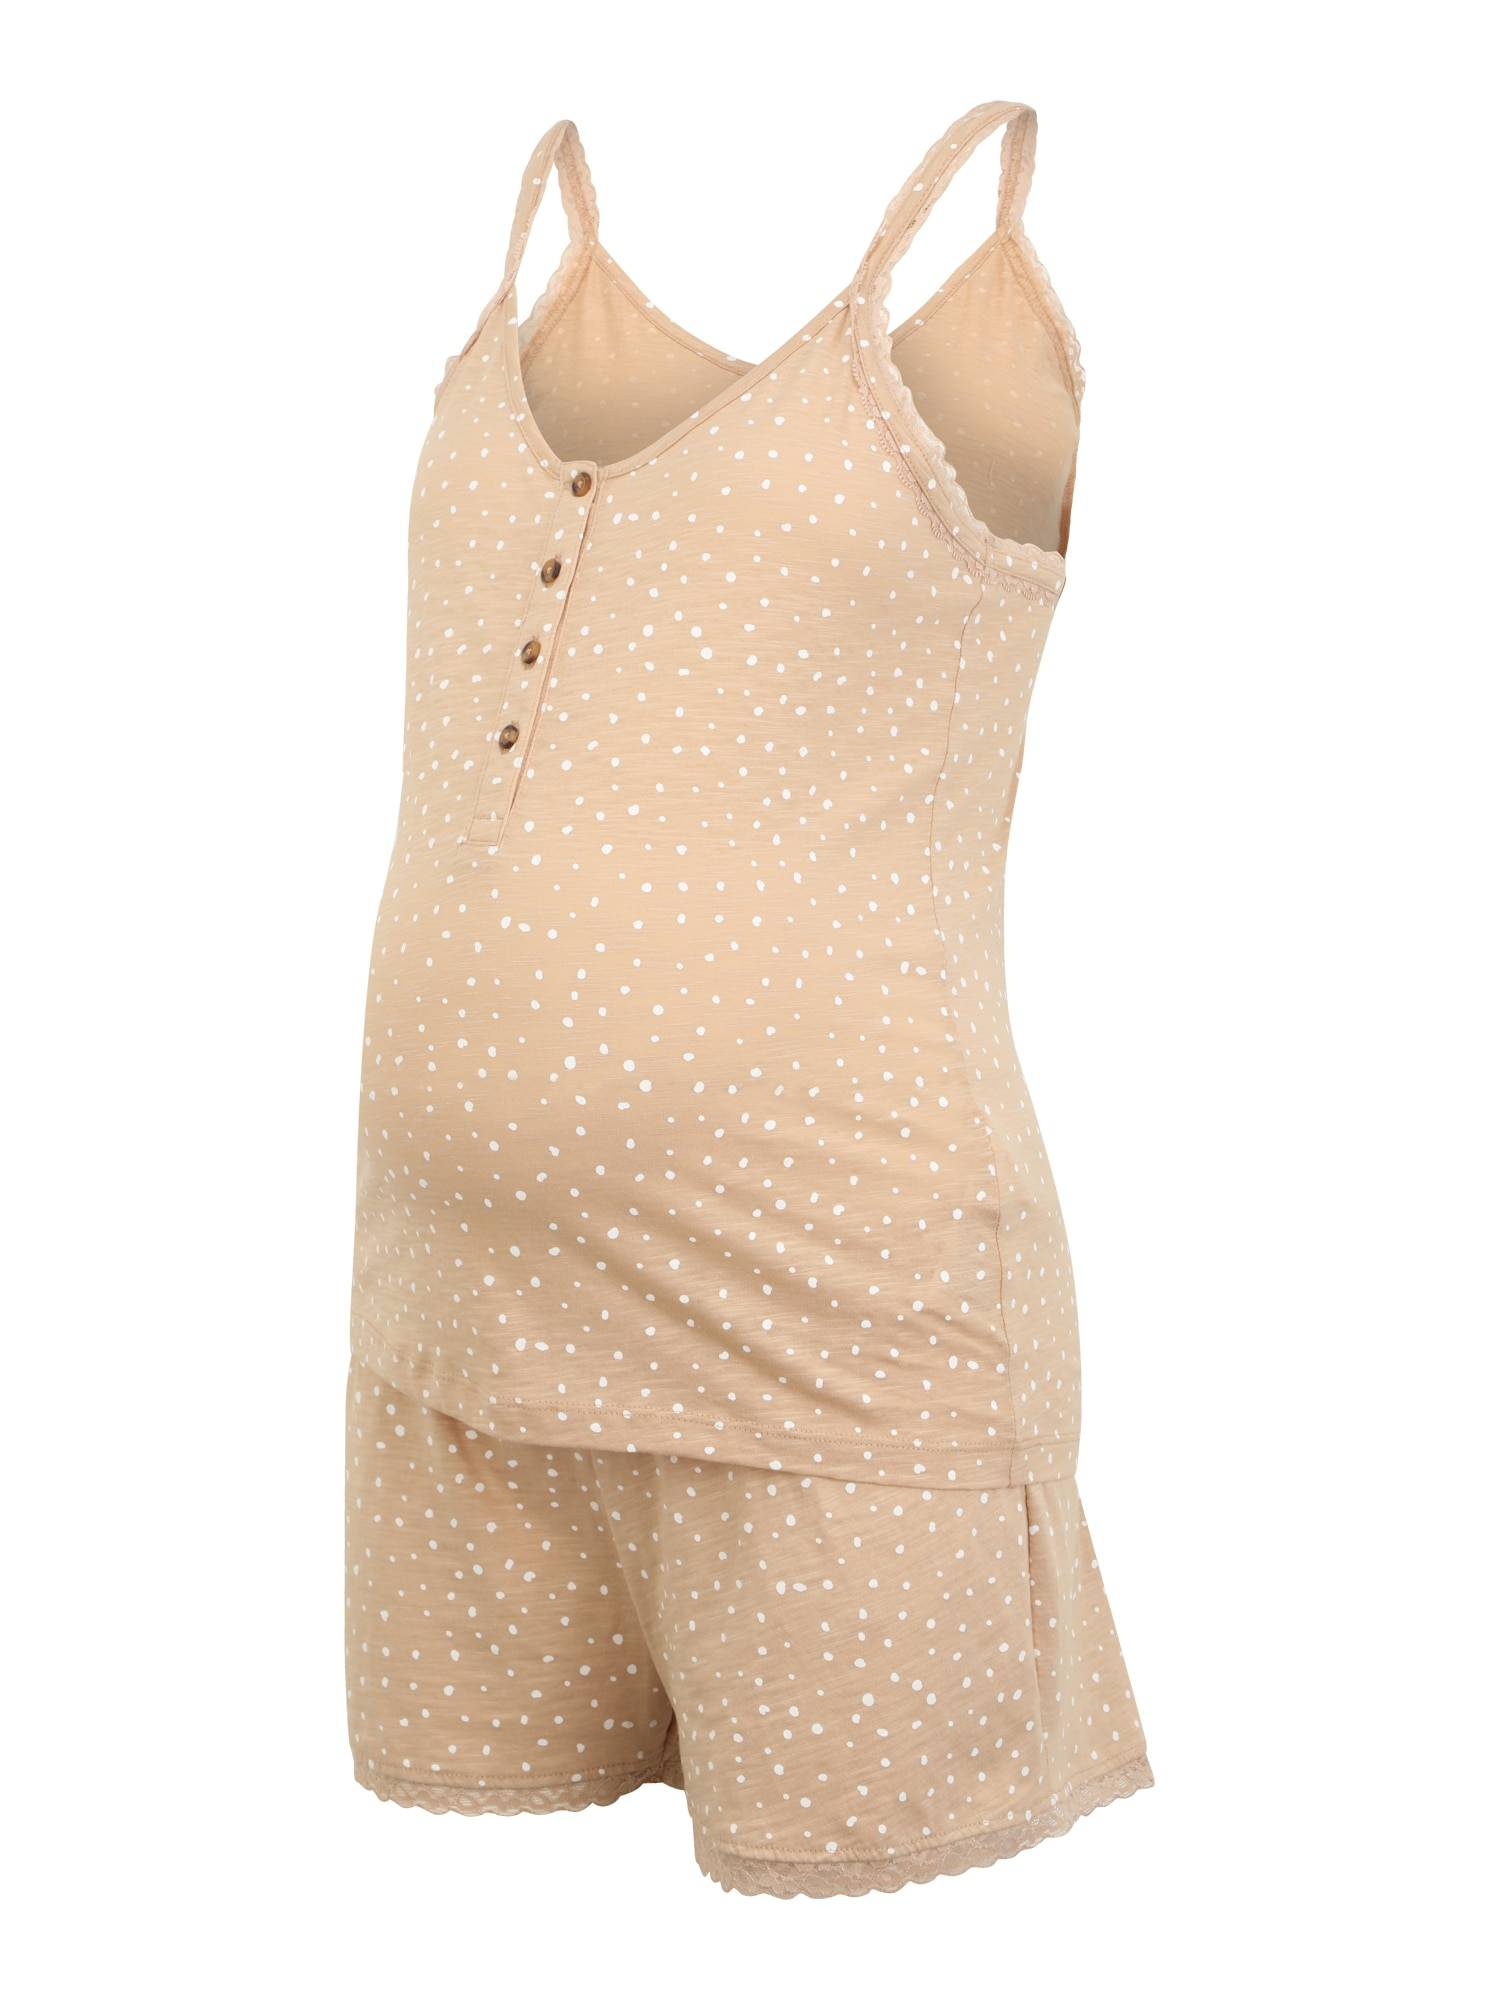 MAMALICIOUS Pyjama  - Beige - Taille: S - female